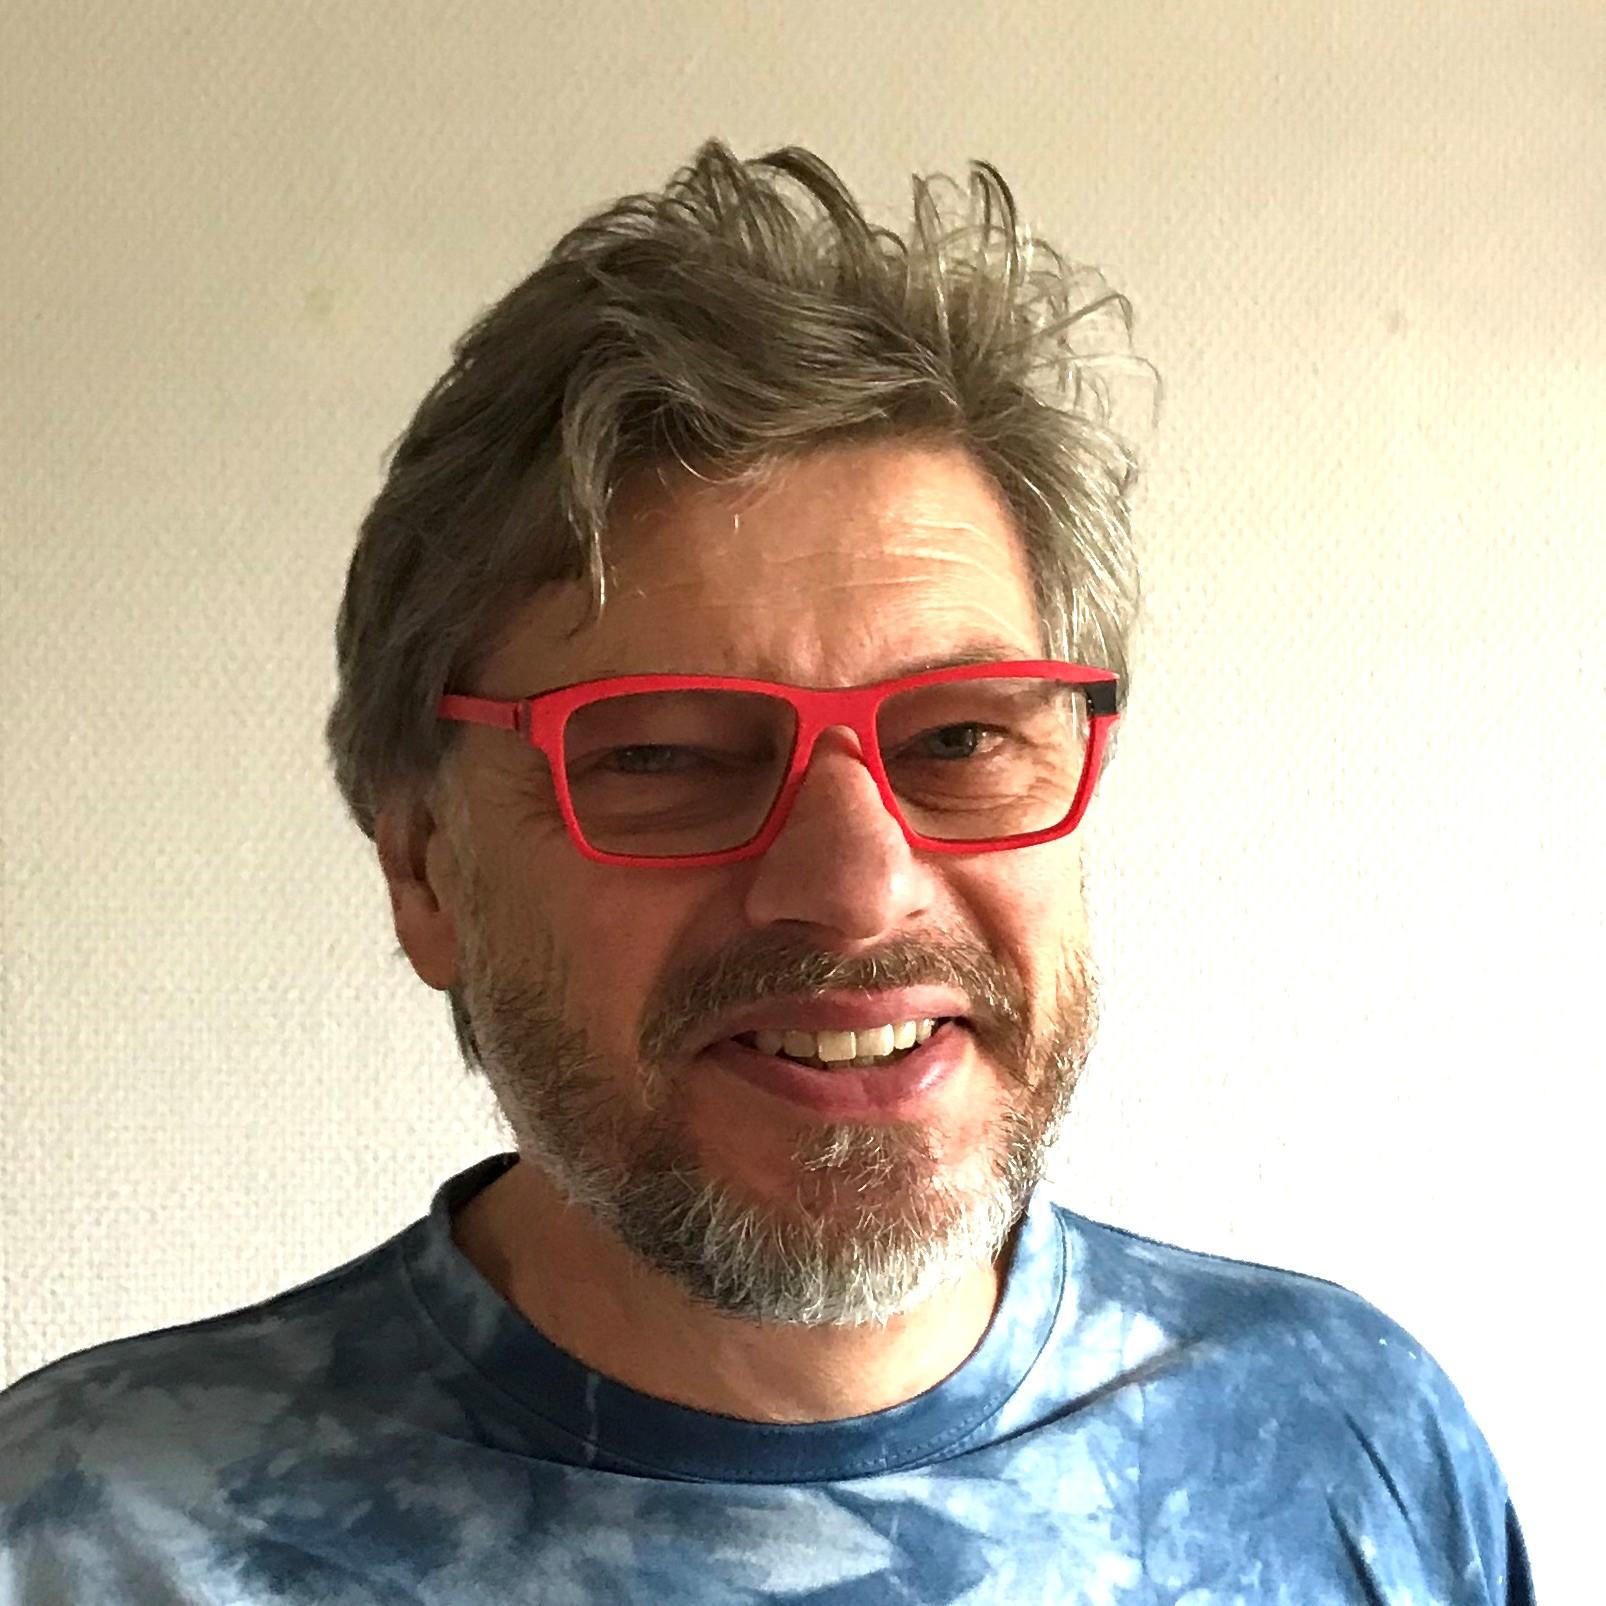 Richard Vervoorn